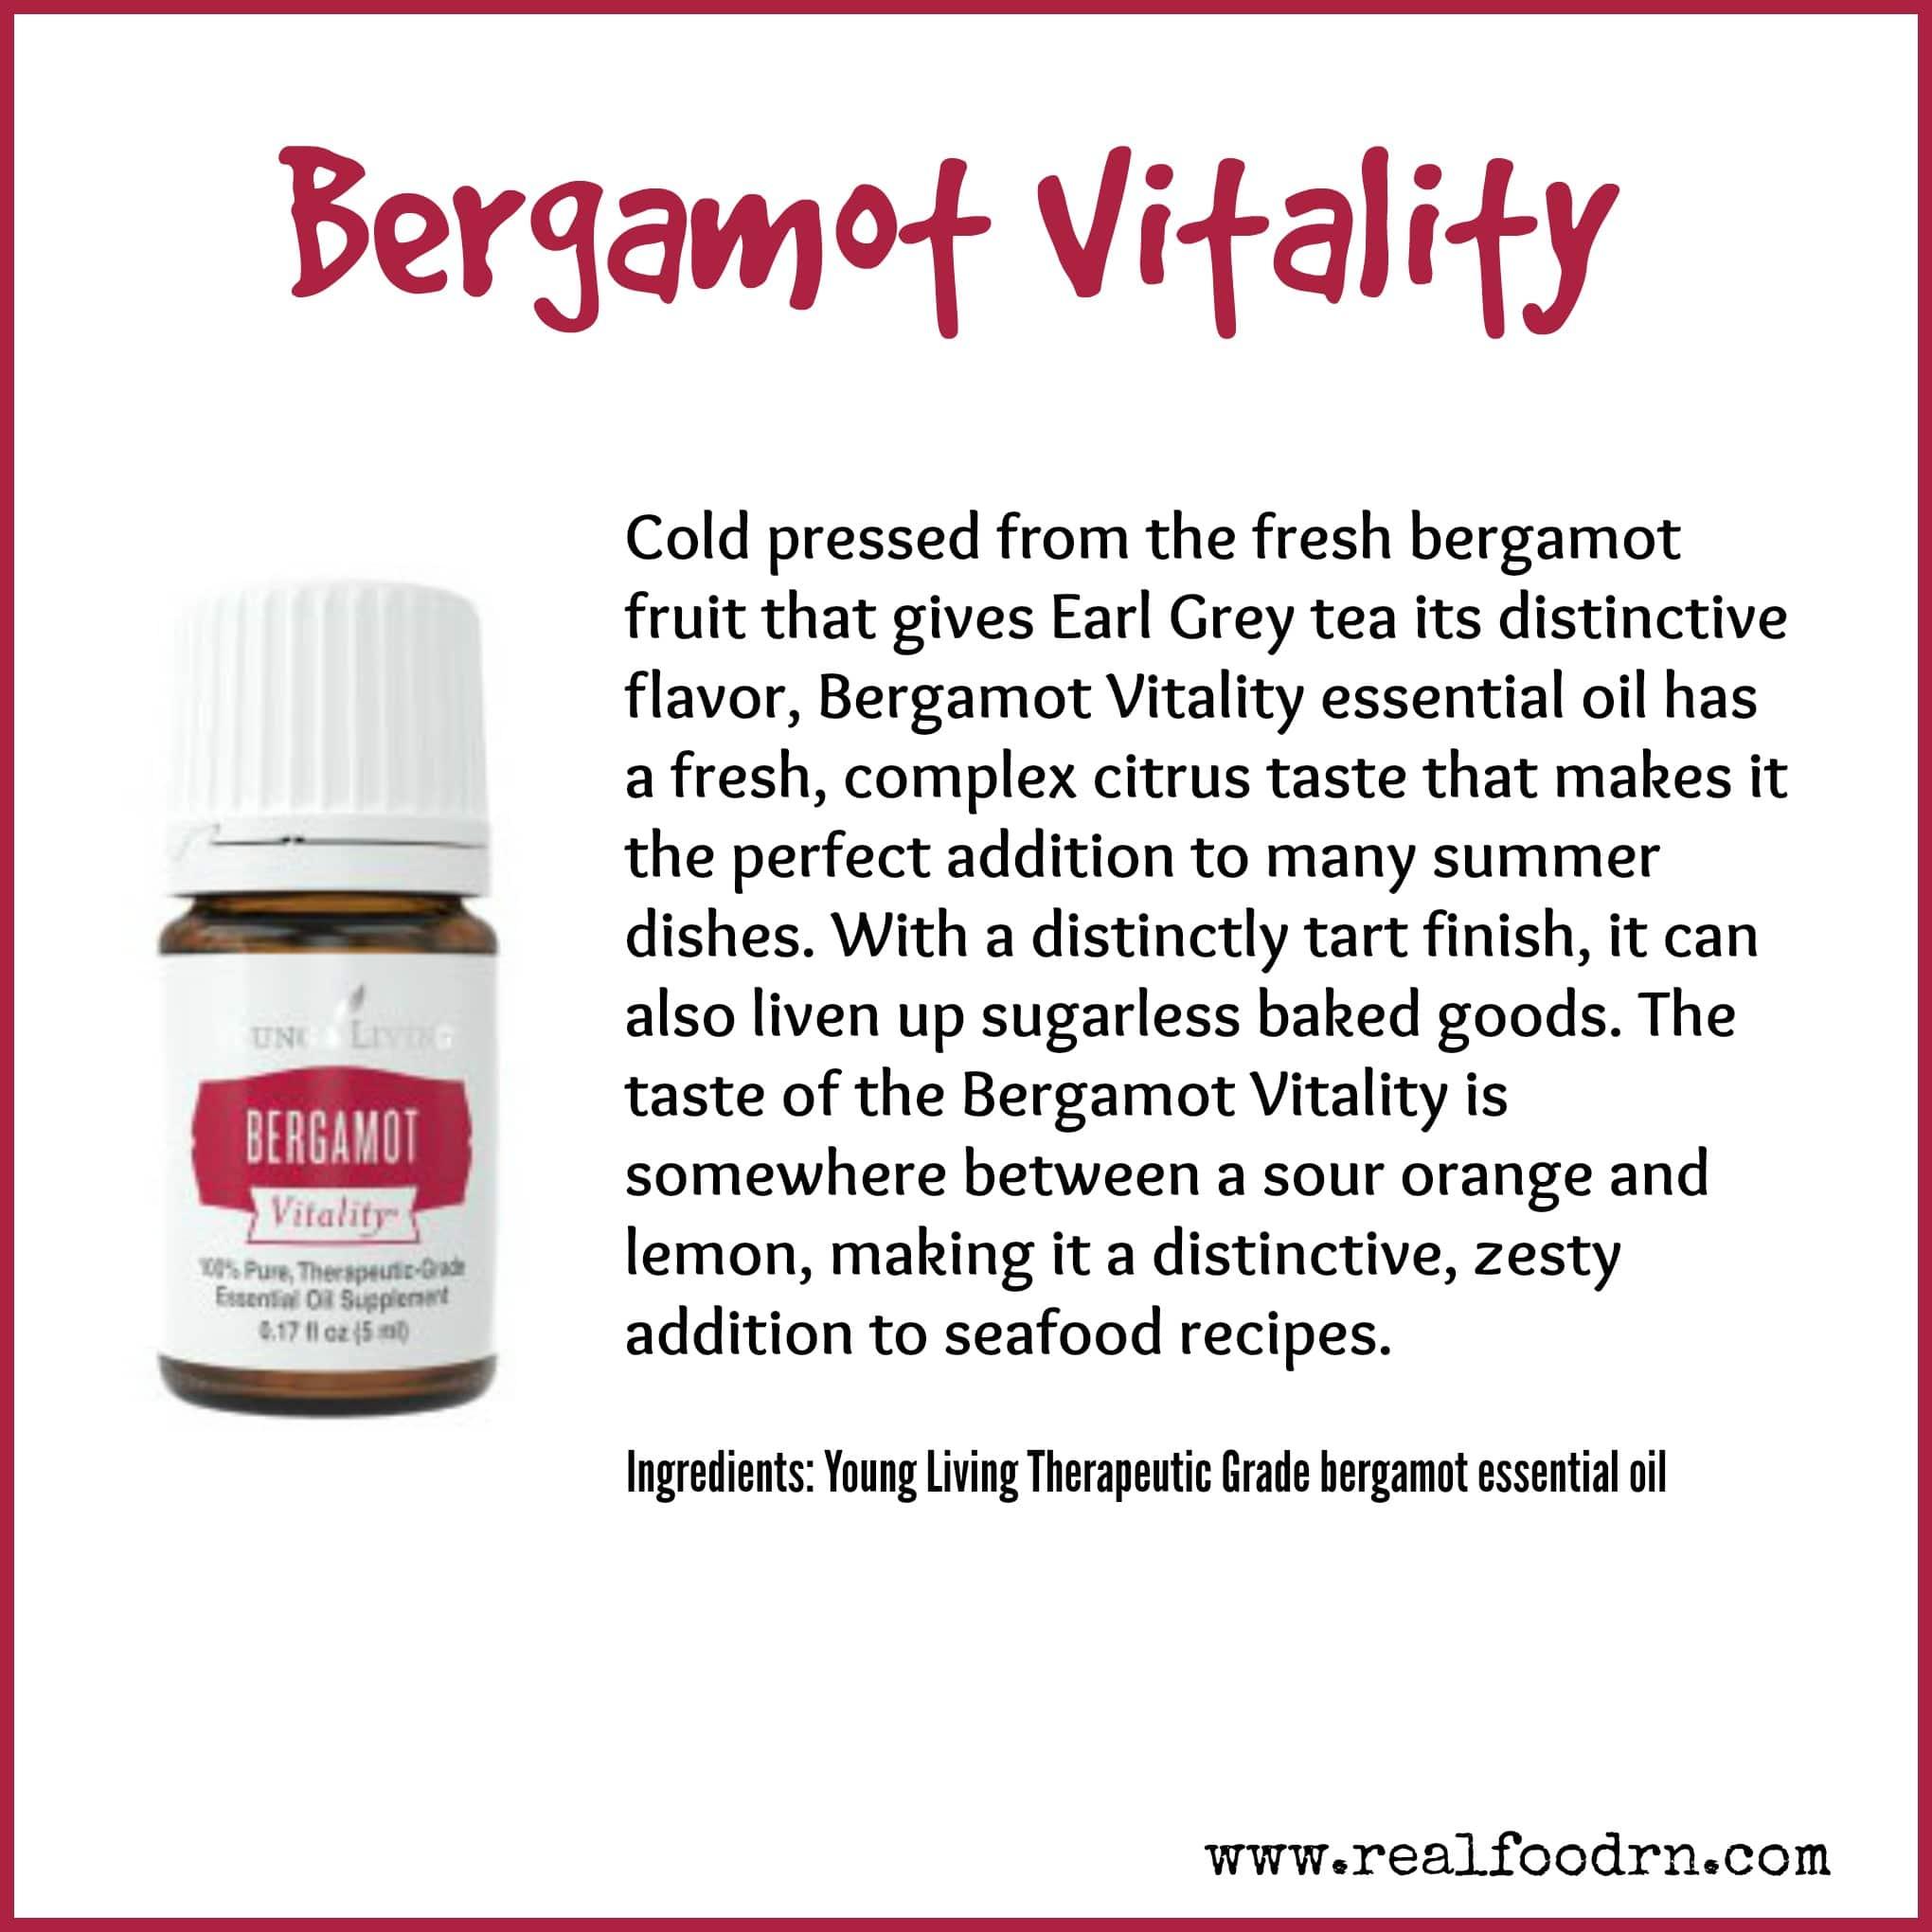 Bergamot Vitality